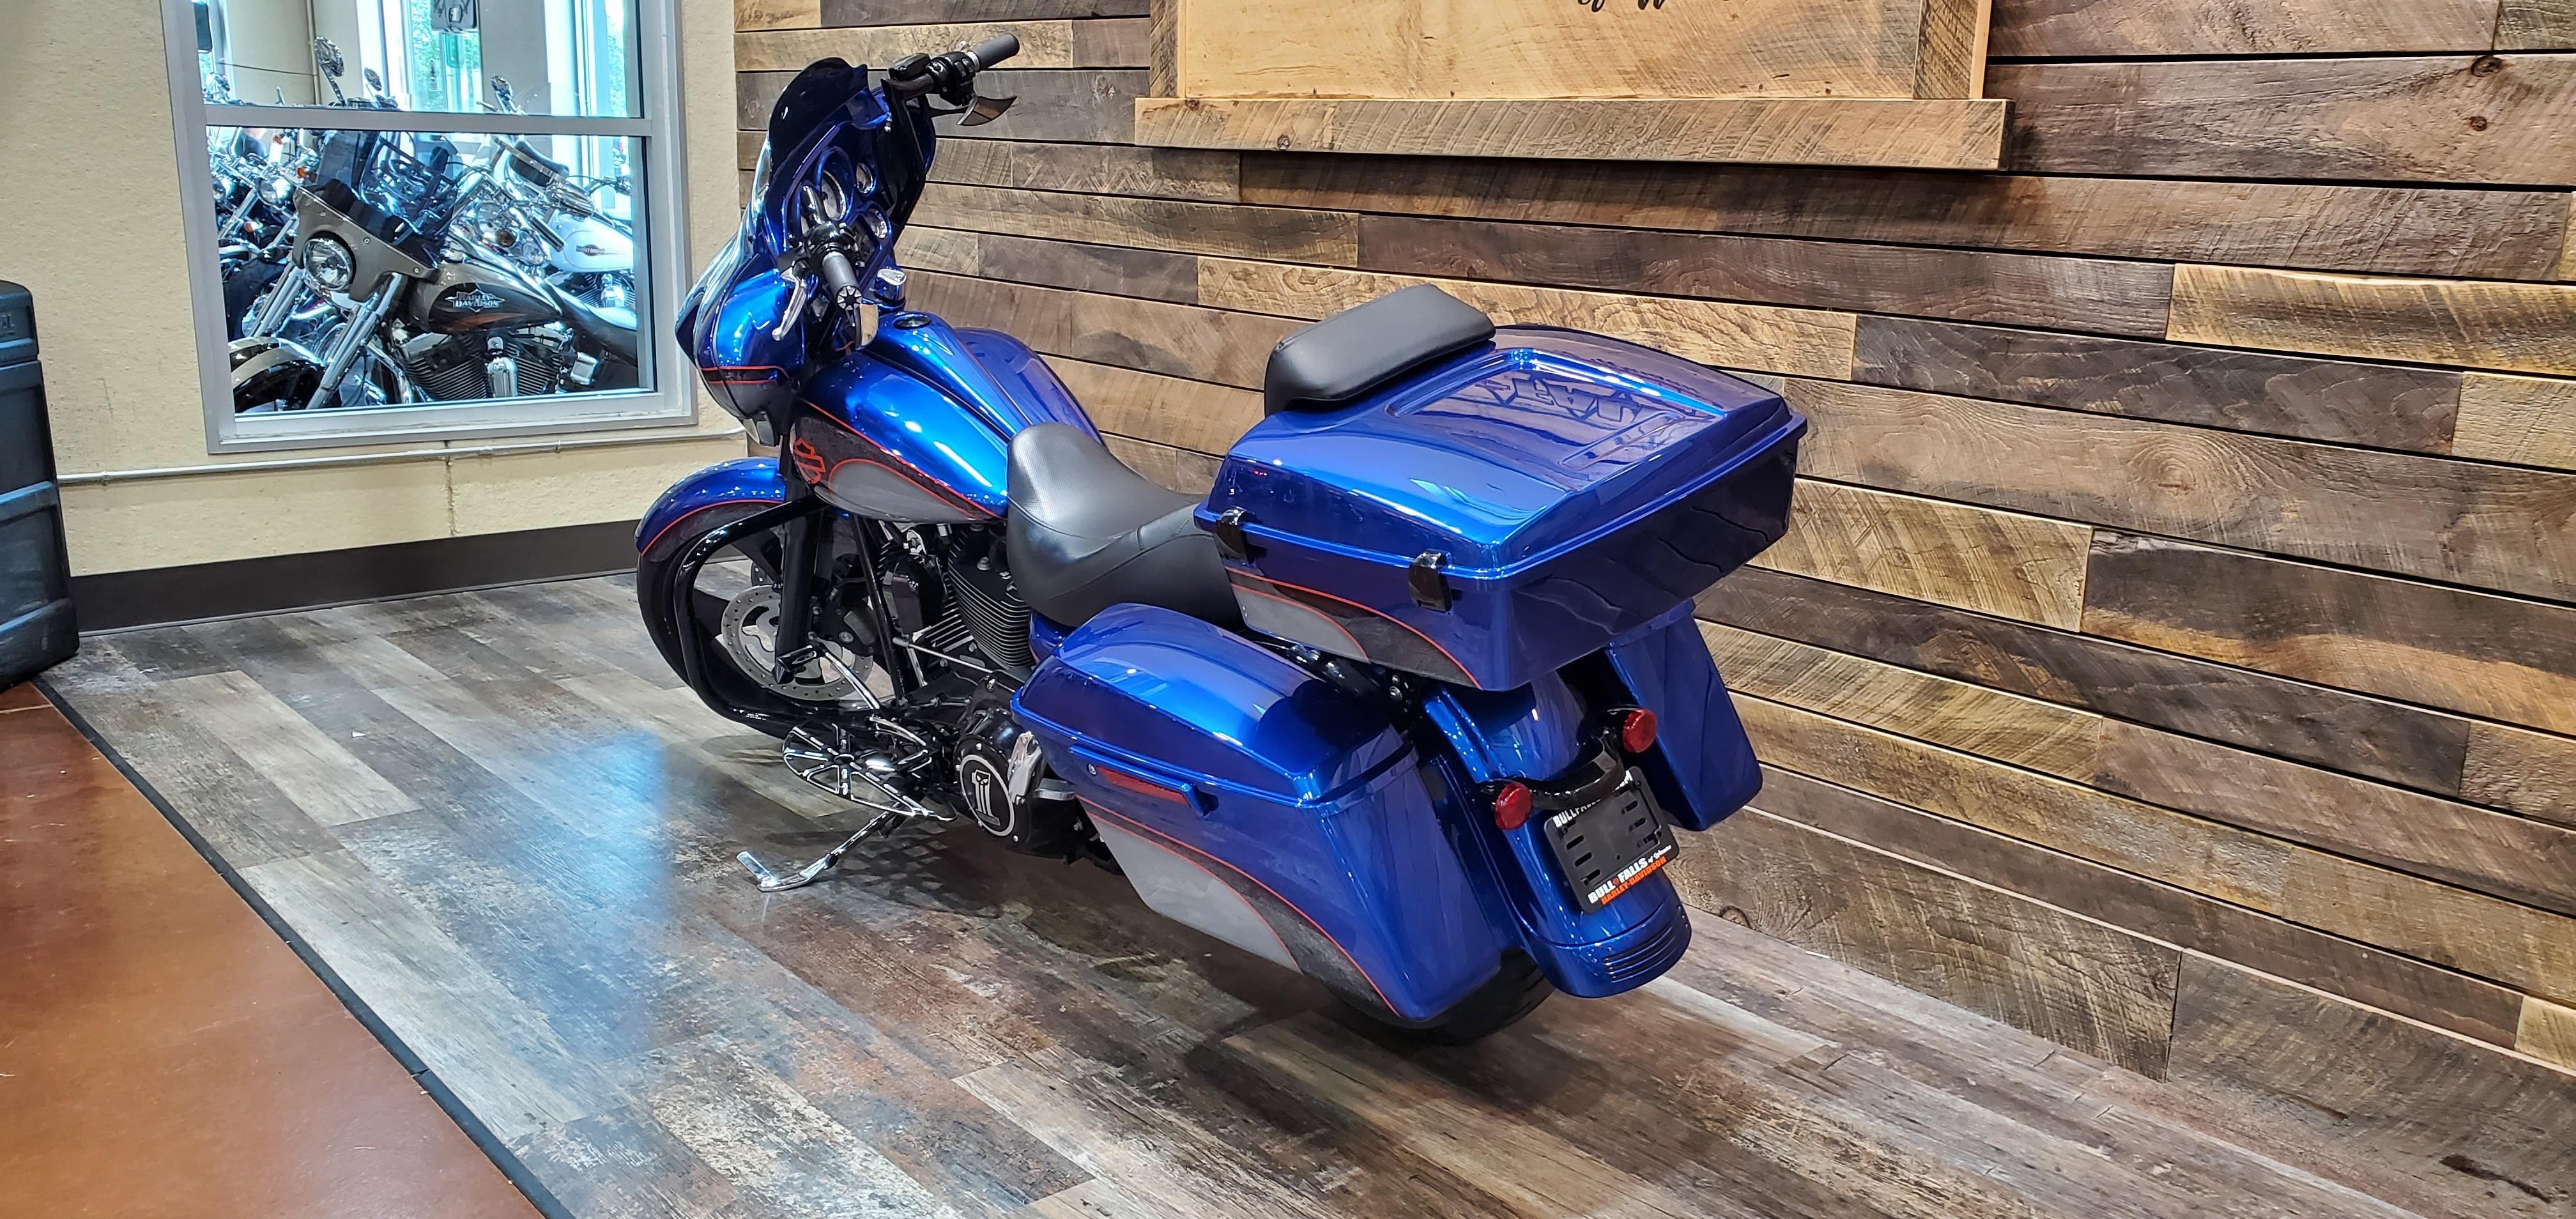 2013 Harley-Davidson Street Glide Base at Bull Falls Harley-Davidson